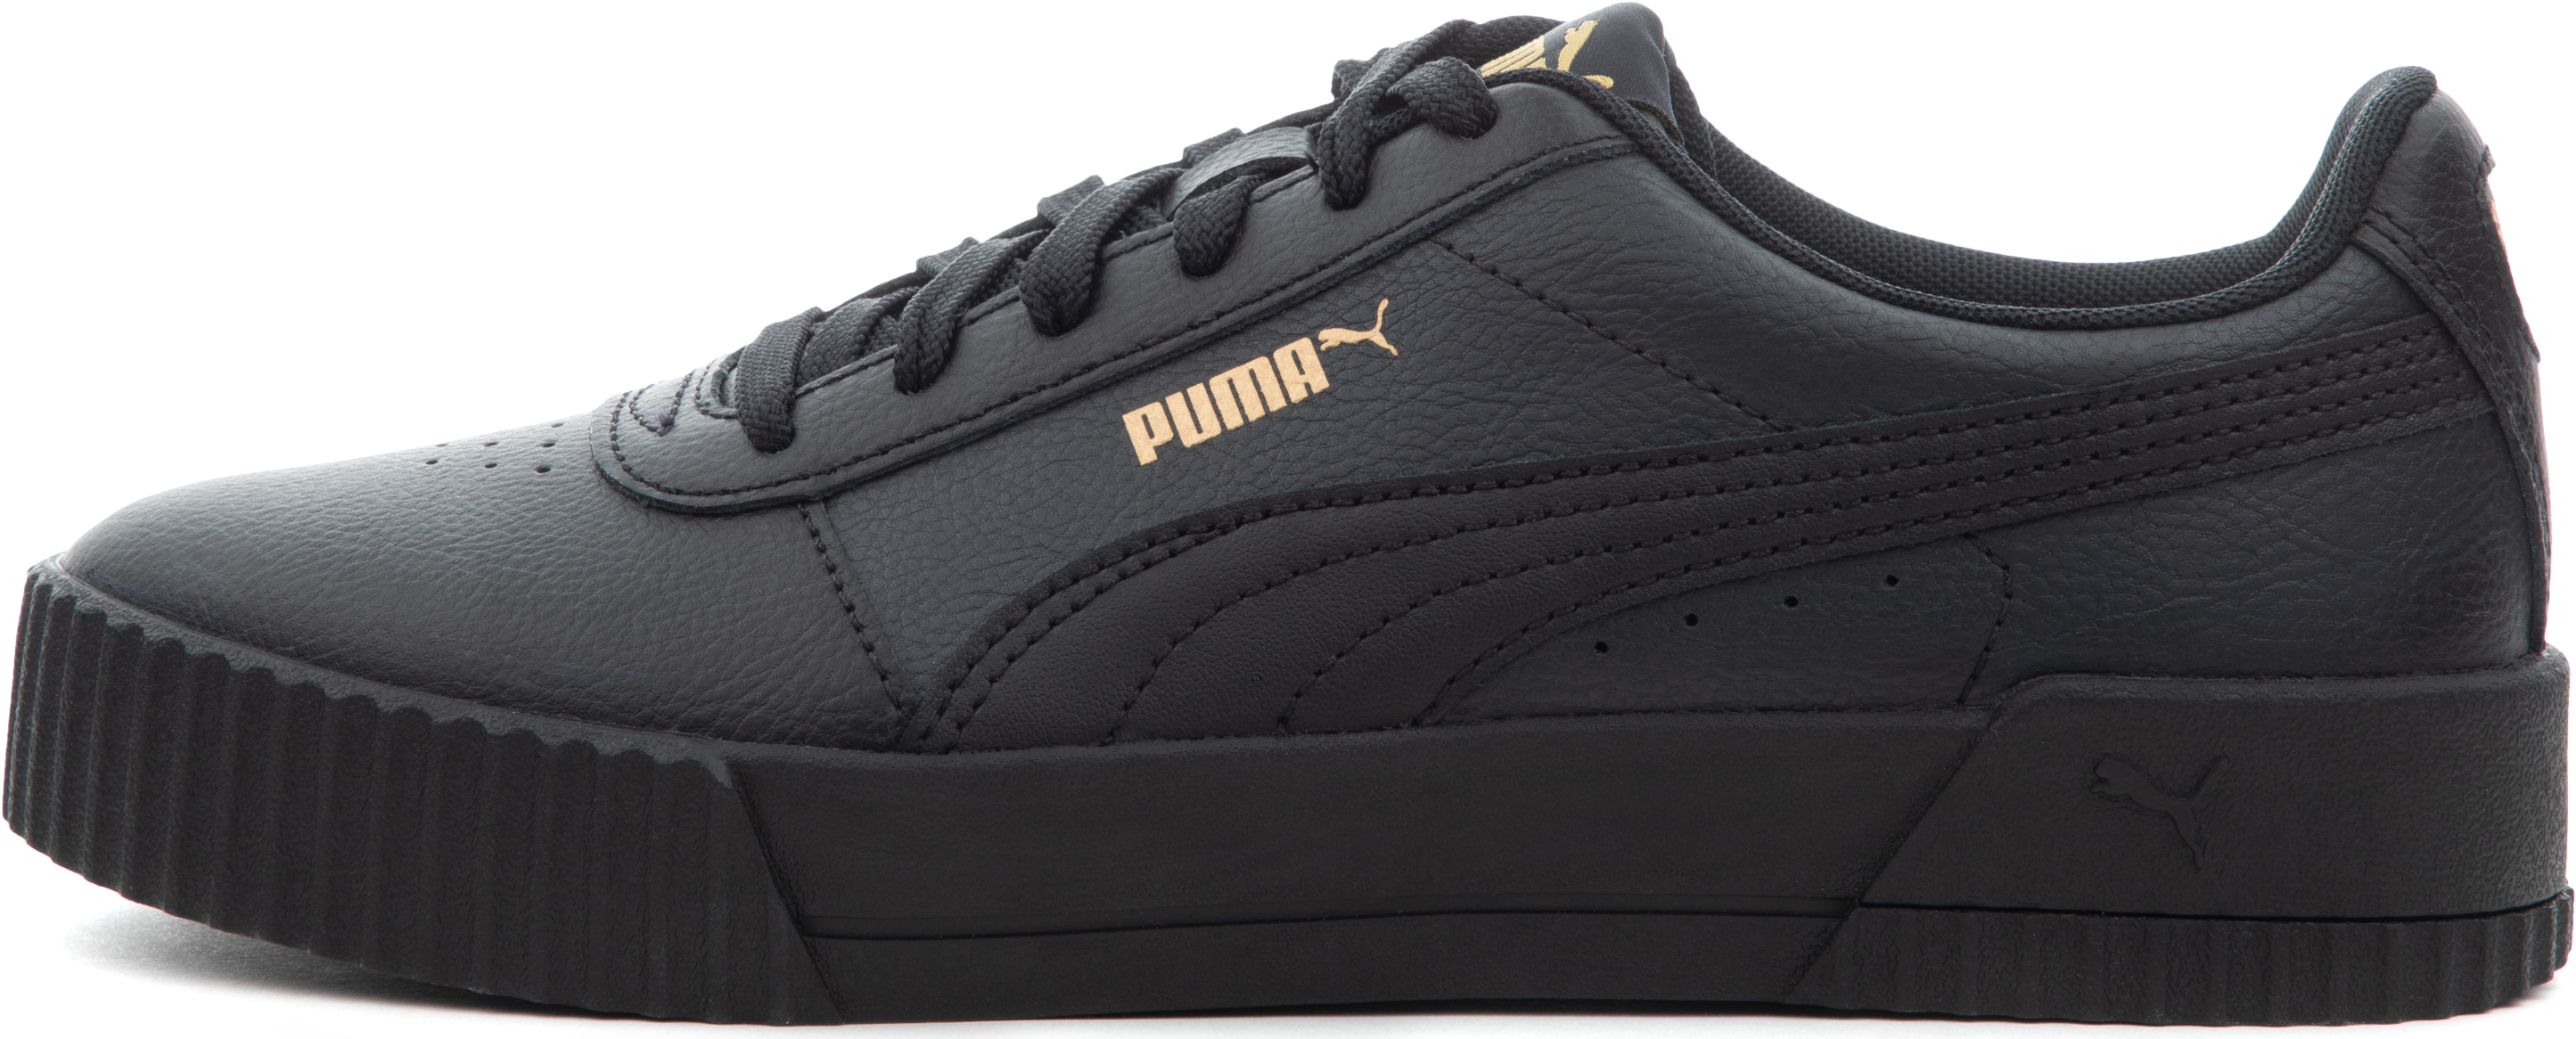 PUMA Кеды женские Puma W Carina, размер 39 кеды omega x w metallic